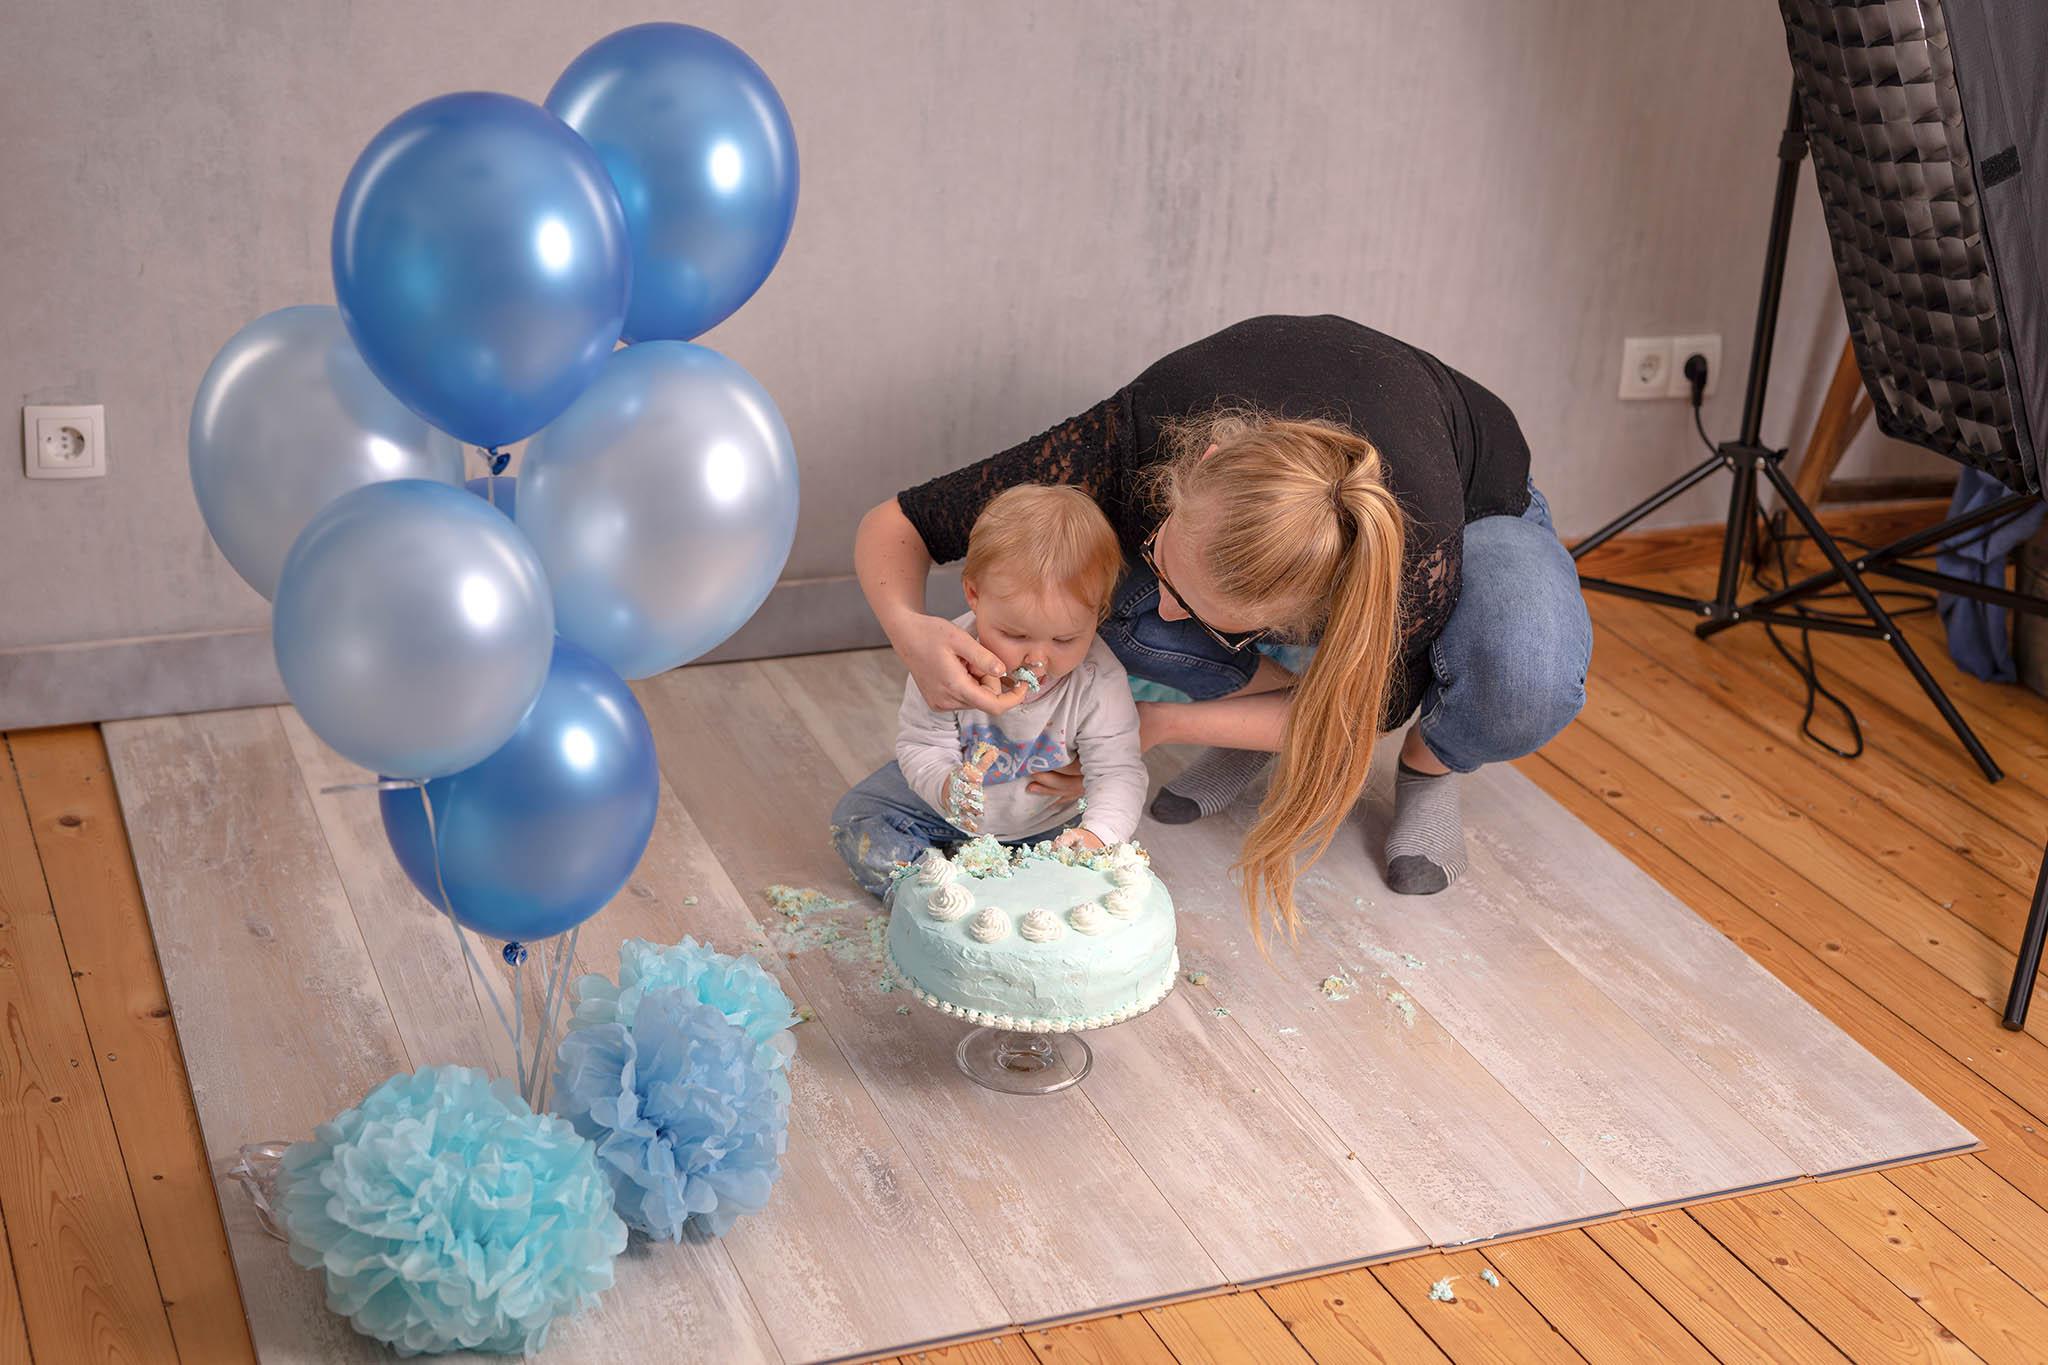 Cake-Smash-Kuchen-Baby-Fotografin-Düsseldorf-Making-of-Fotostudio